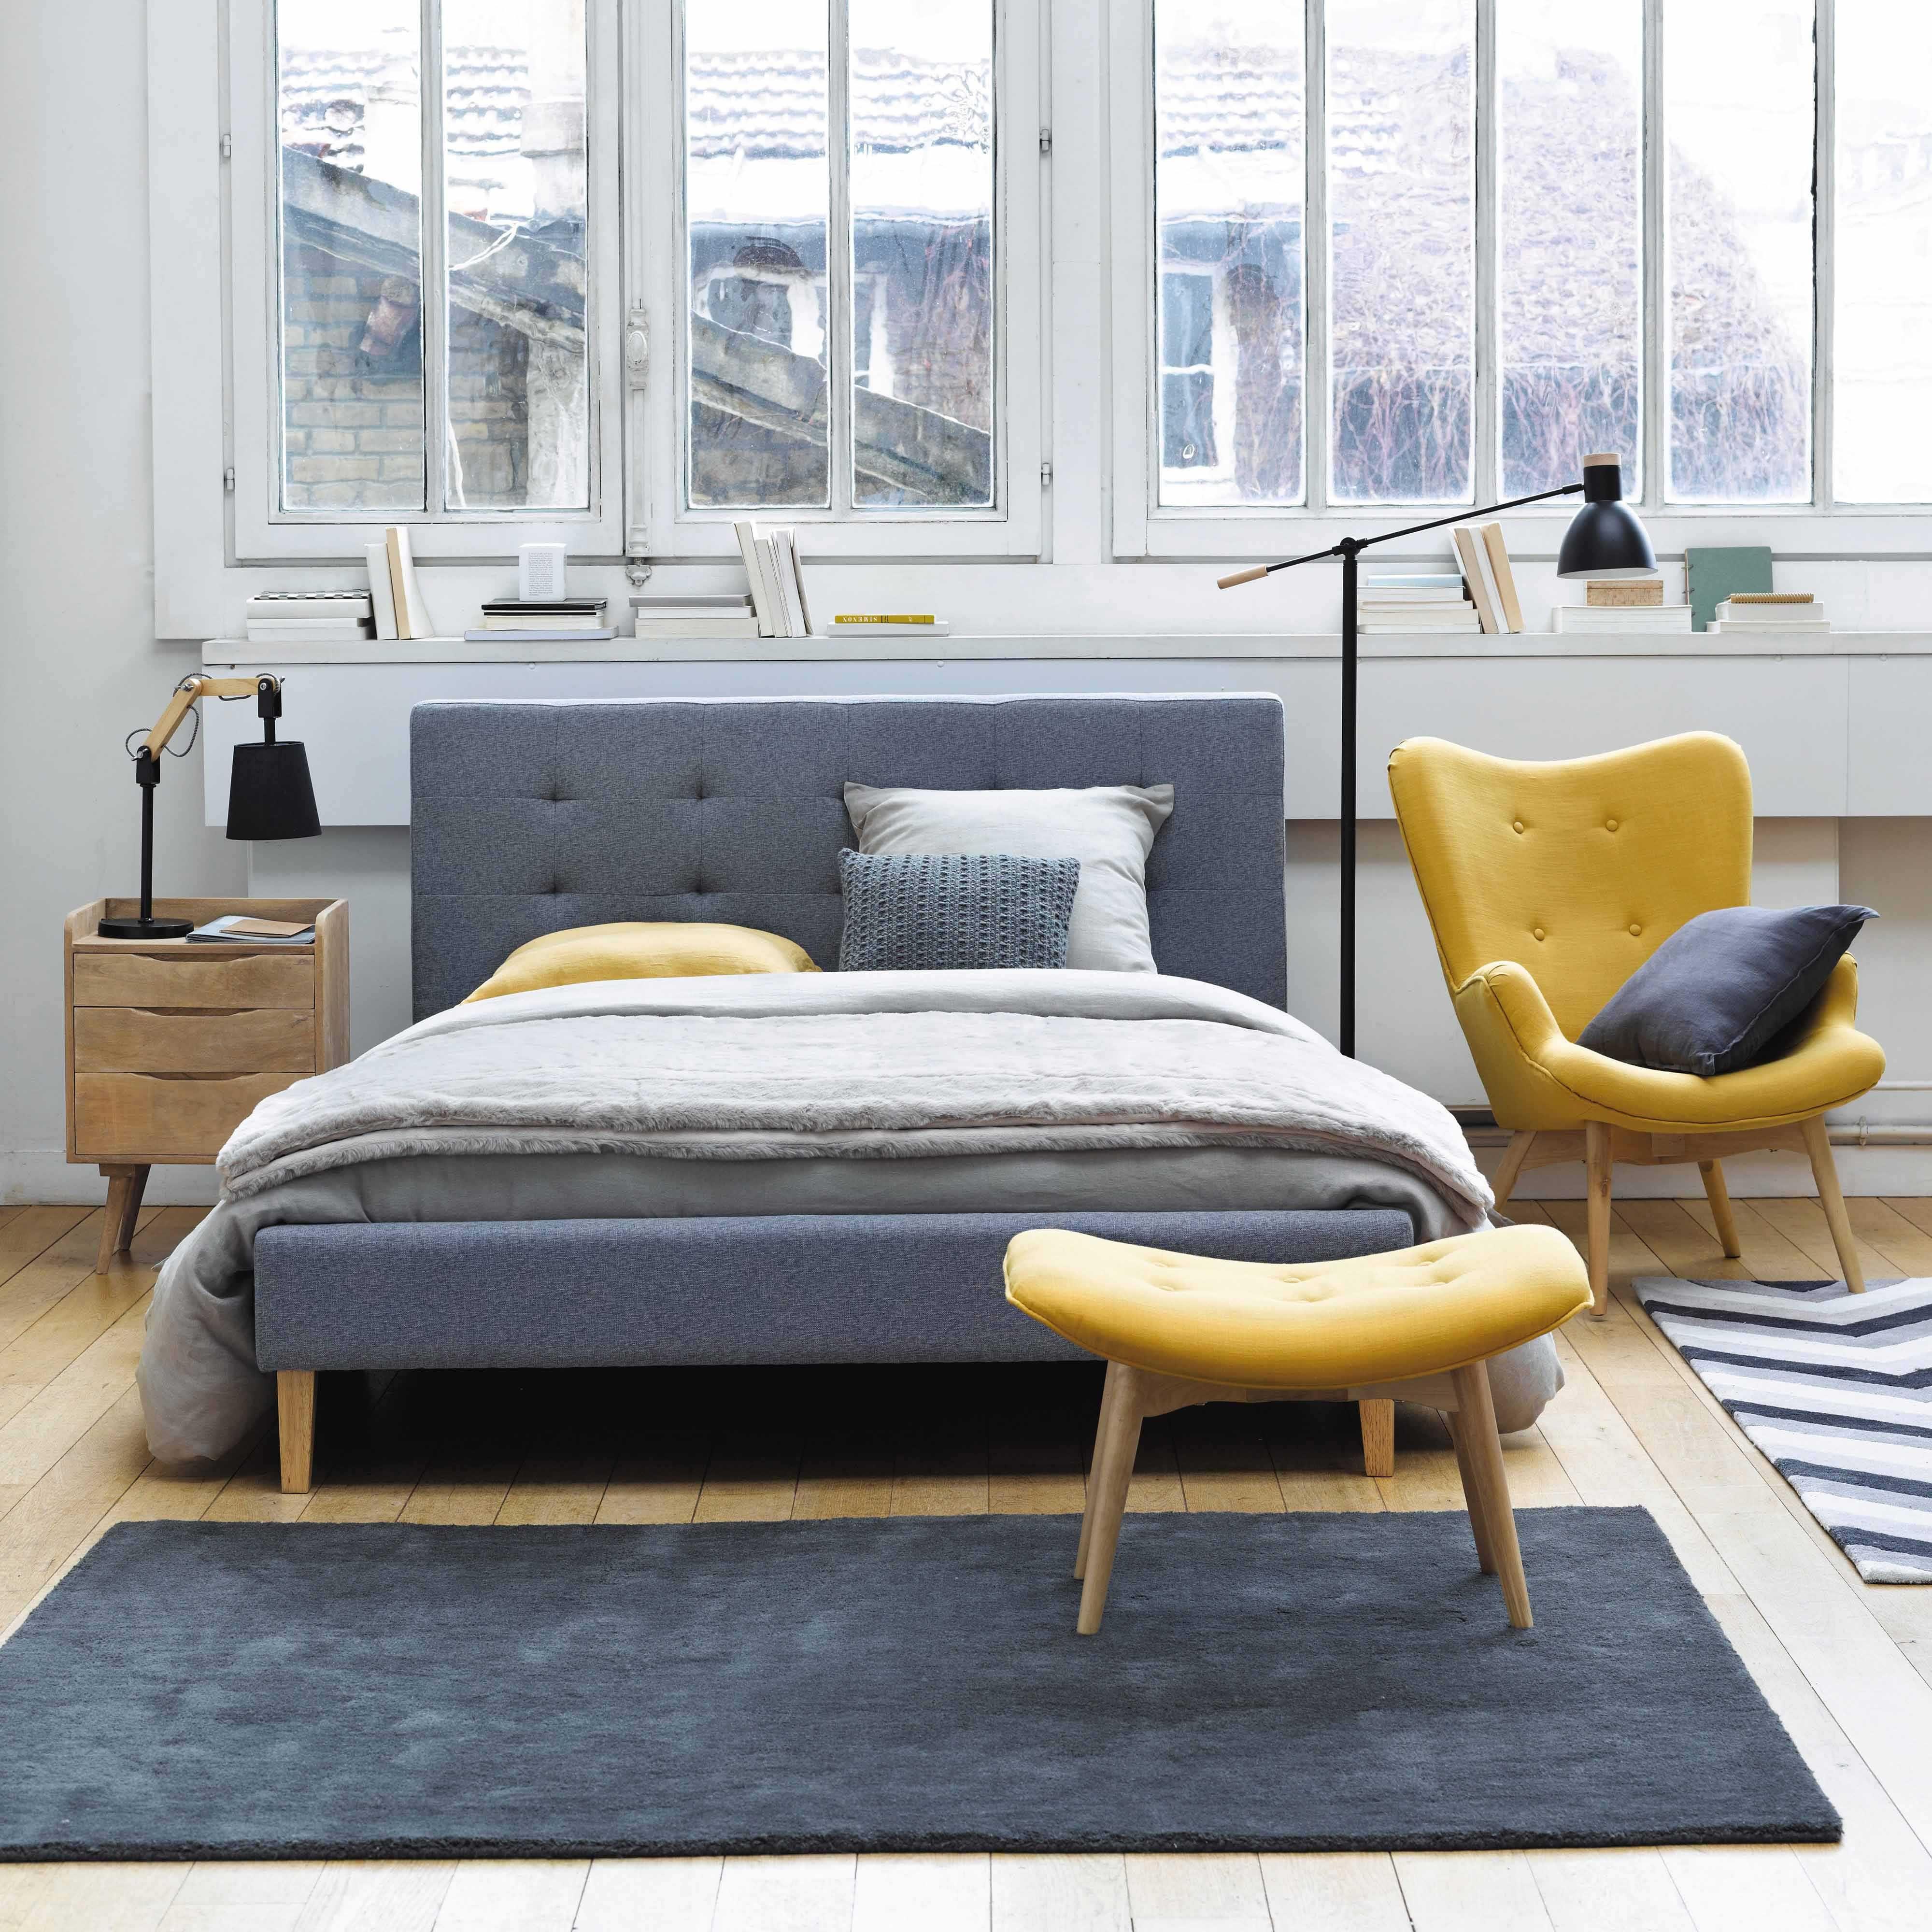 Fauteuil scandinave jaune | Maison du monde, Tissu jaune et Pie